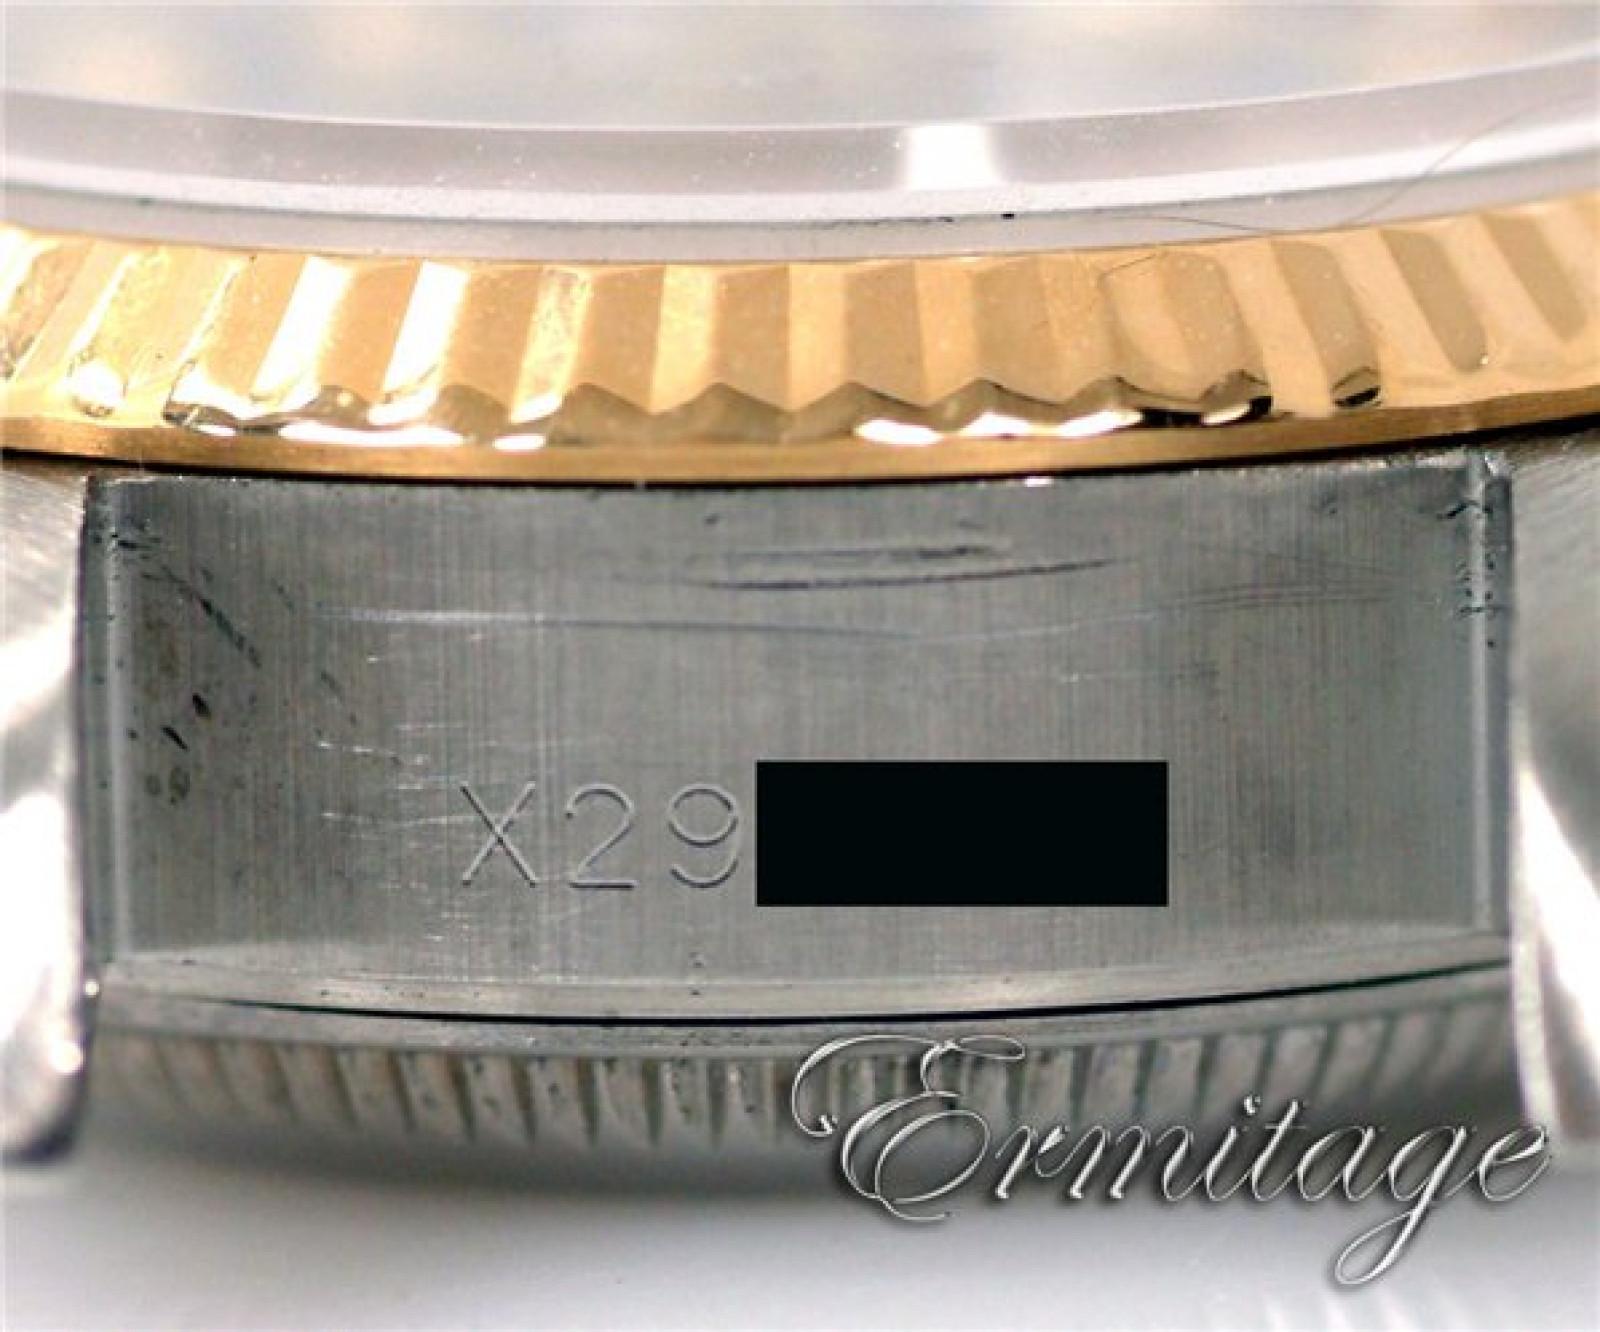 Rolex Datejust 69173 with Diamonds Gold & Steel